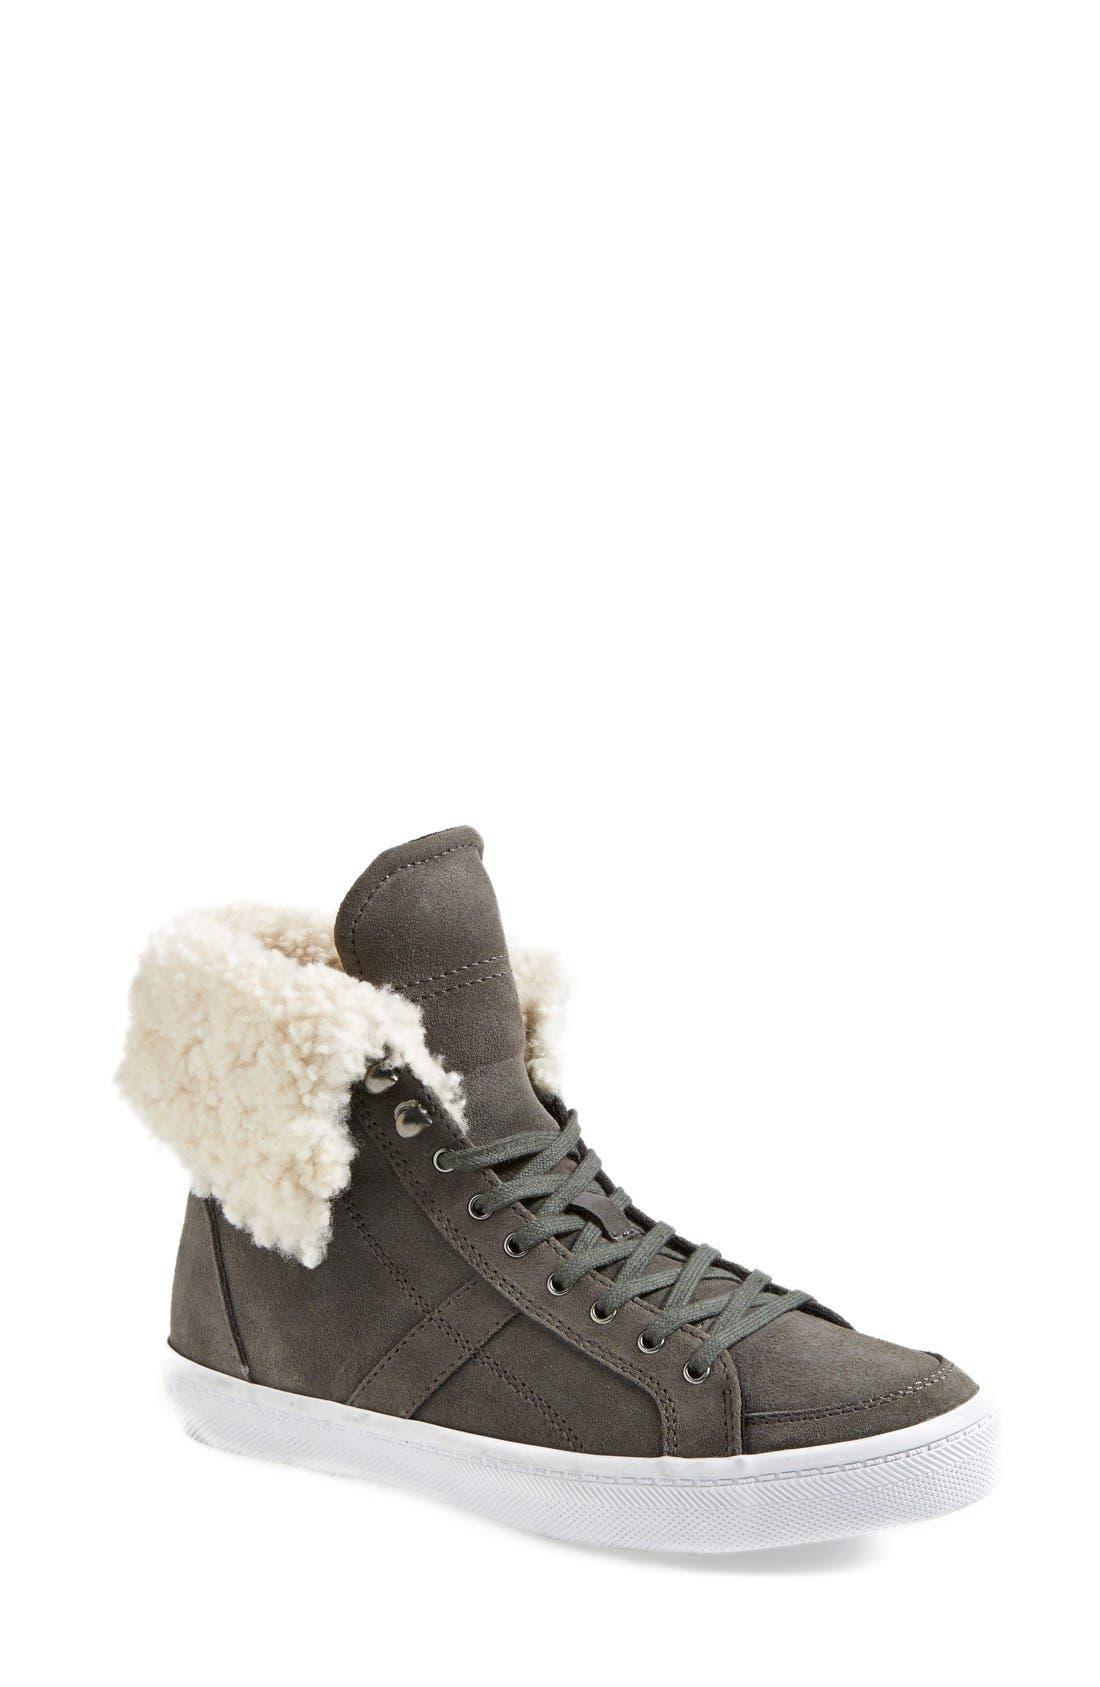 REBECCA MINKOFF 'Sasha' Suede High Top Sneaker, Main, color, 020